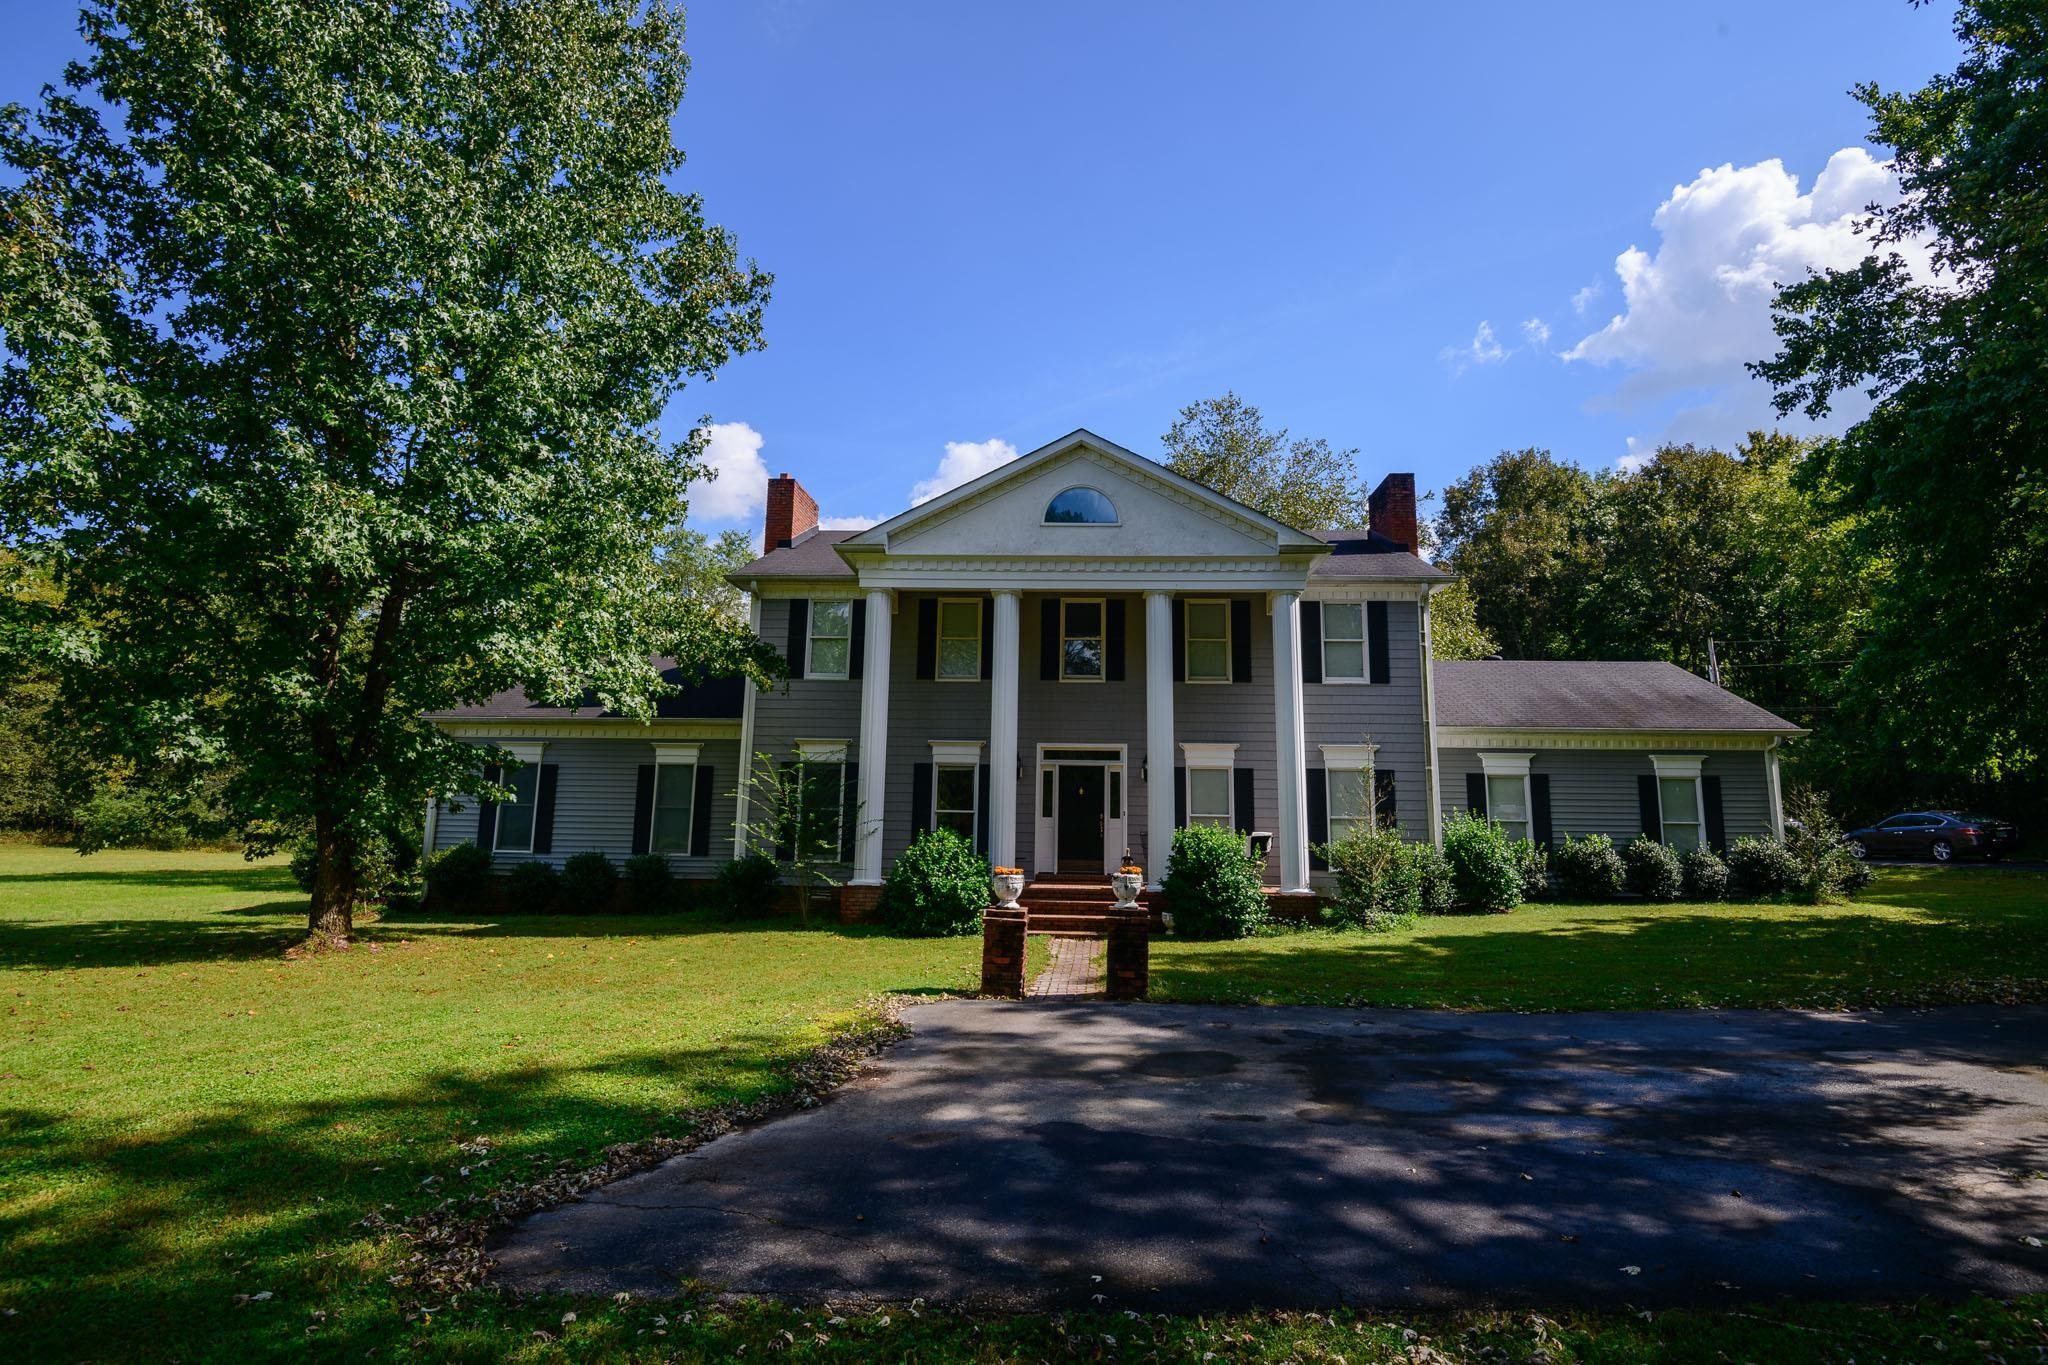 275 Clift Ln, Hartsville, TN 37074 - Hartsville, TN real estate listing